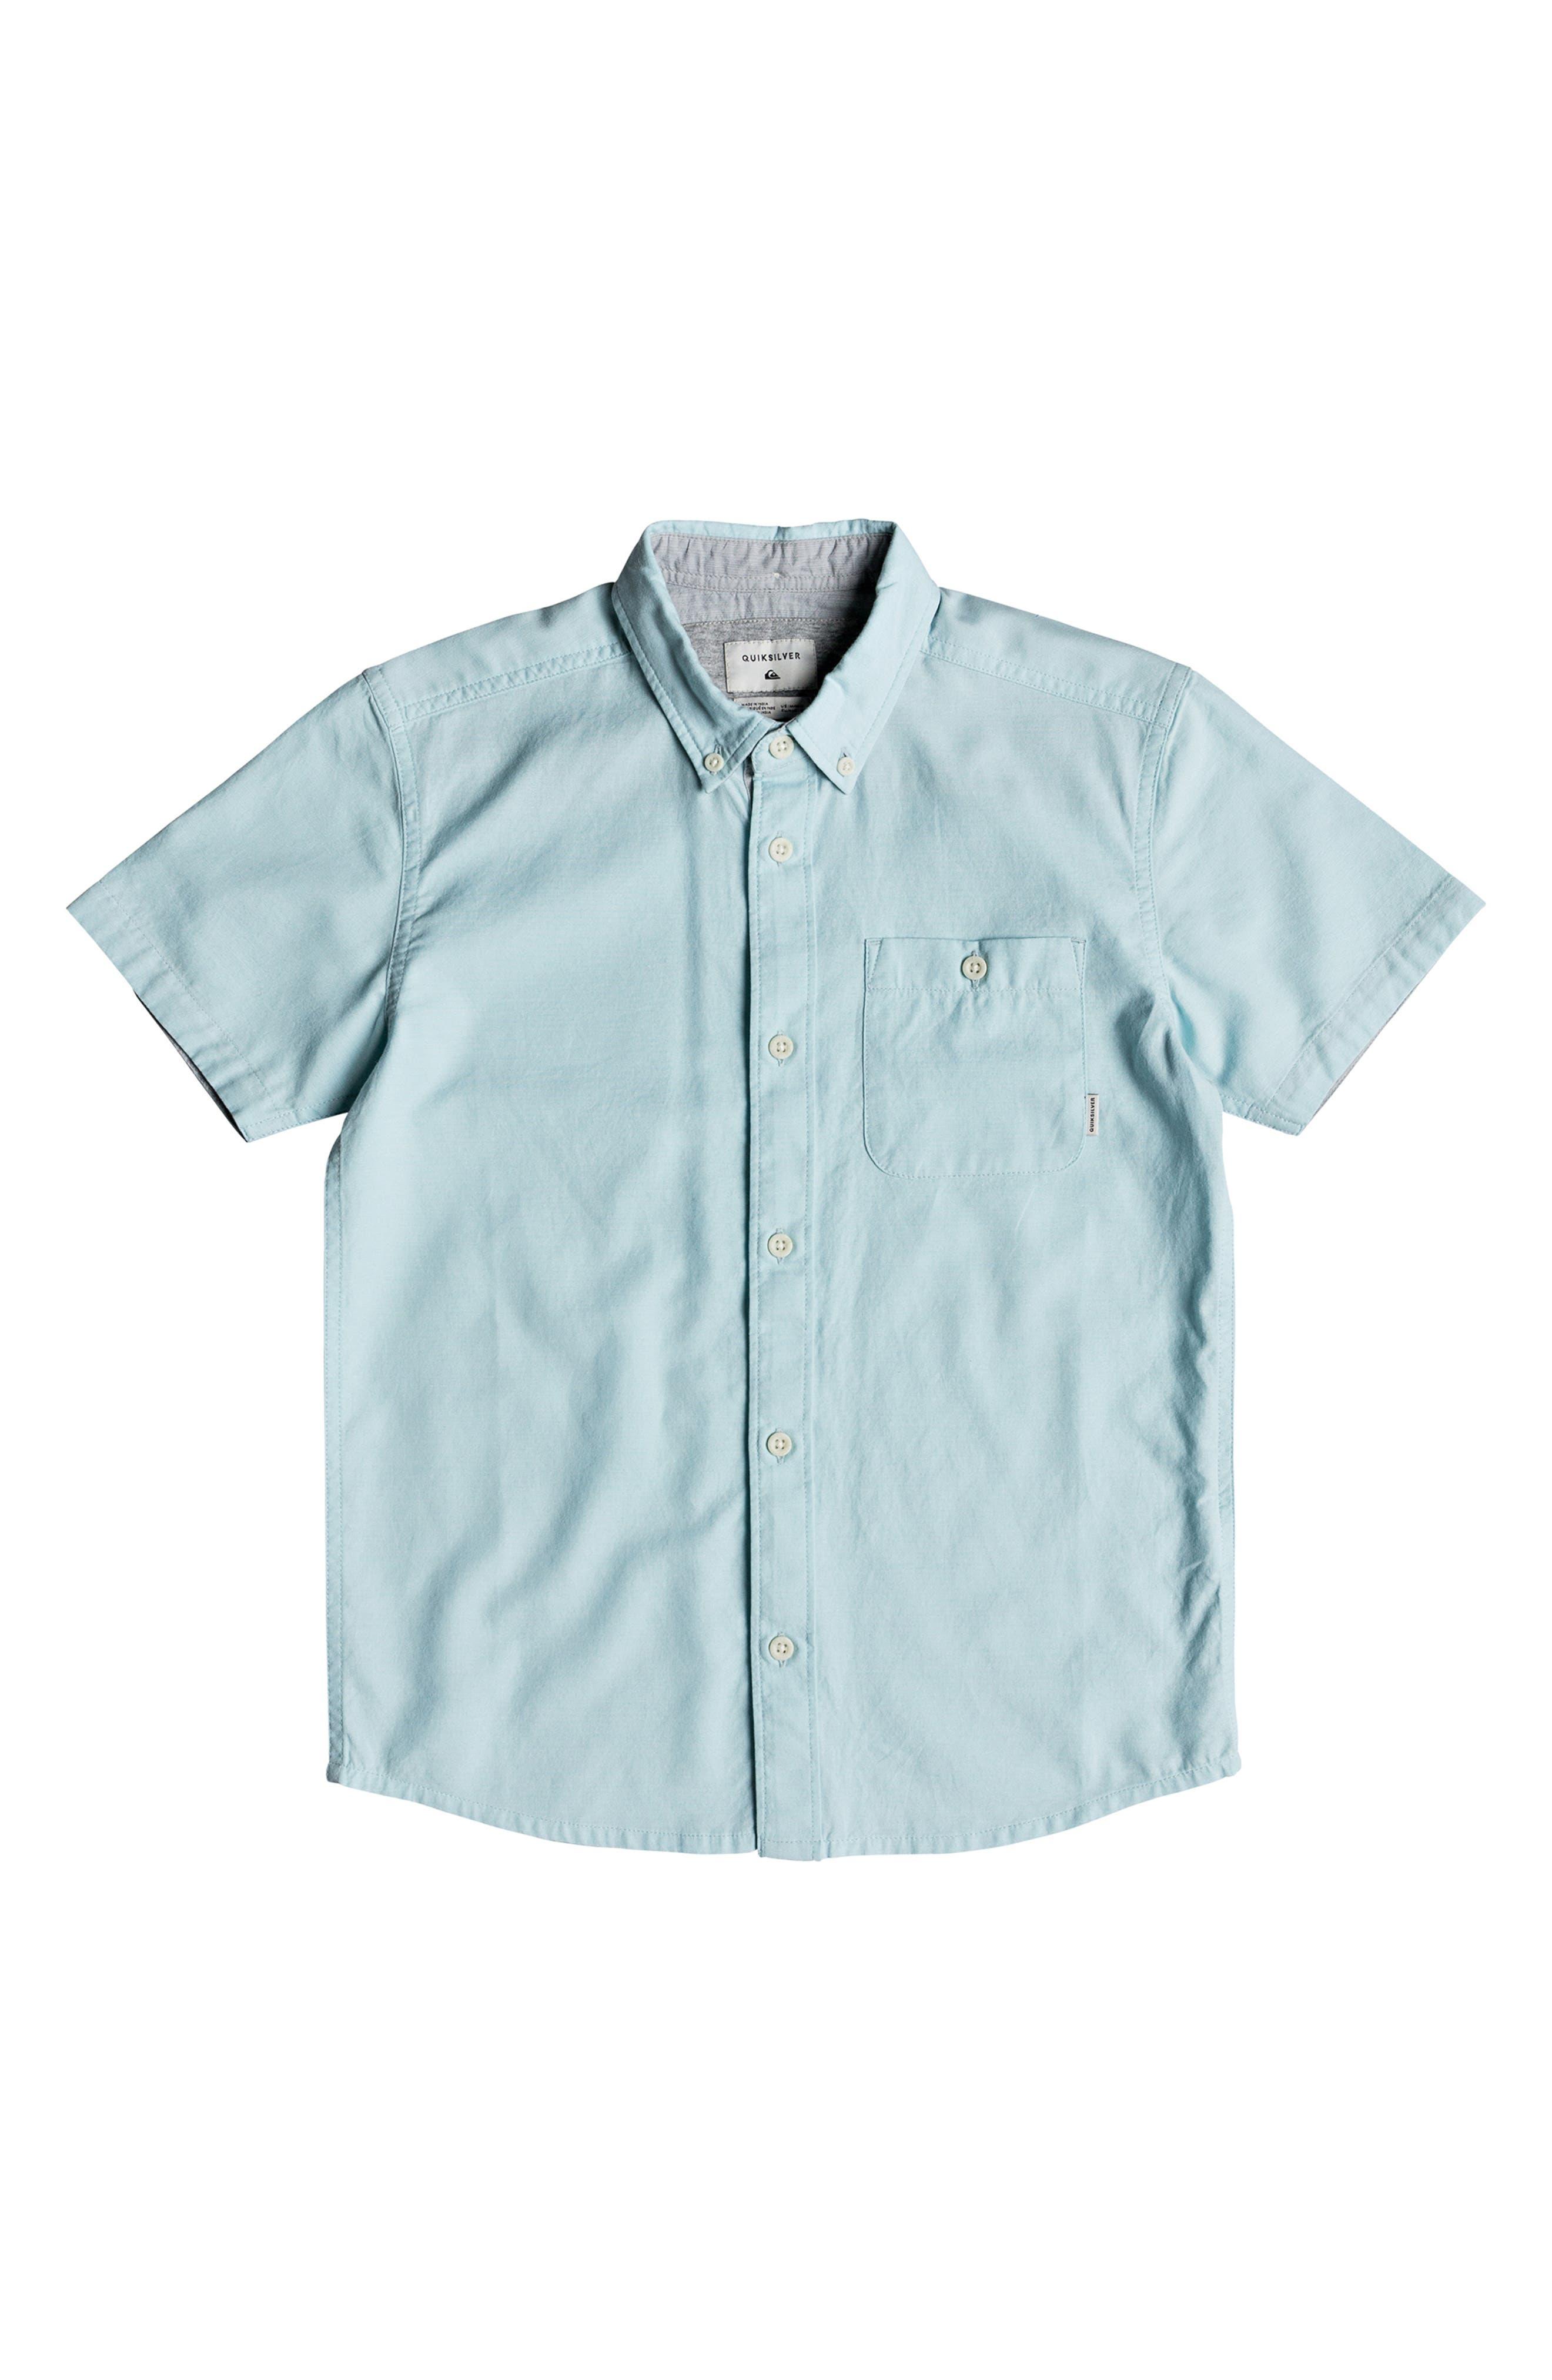 Waterfalls Woven Shirt,                         Main,                         color, AQUATIC